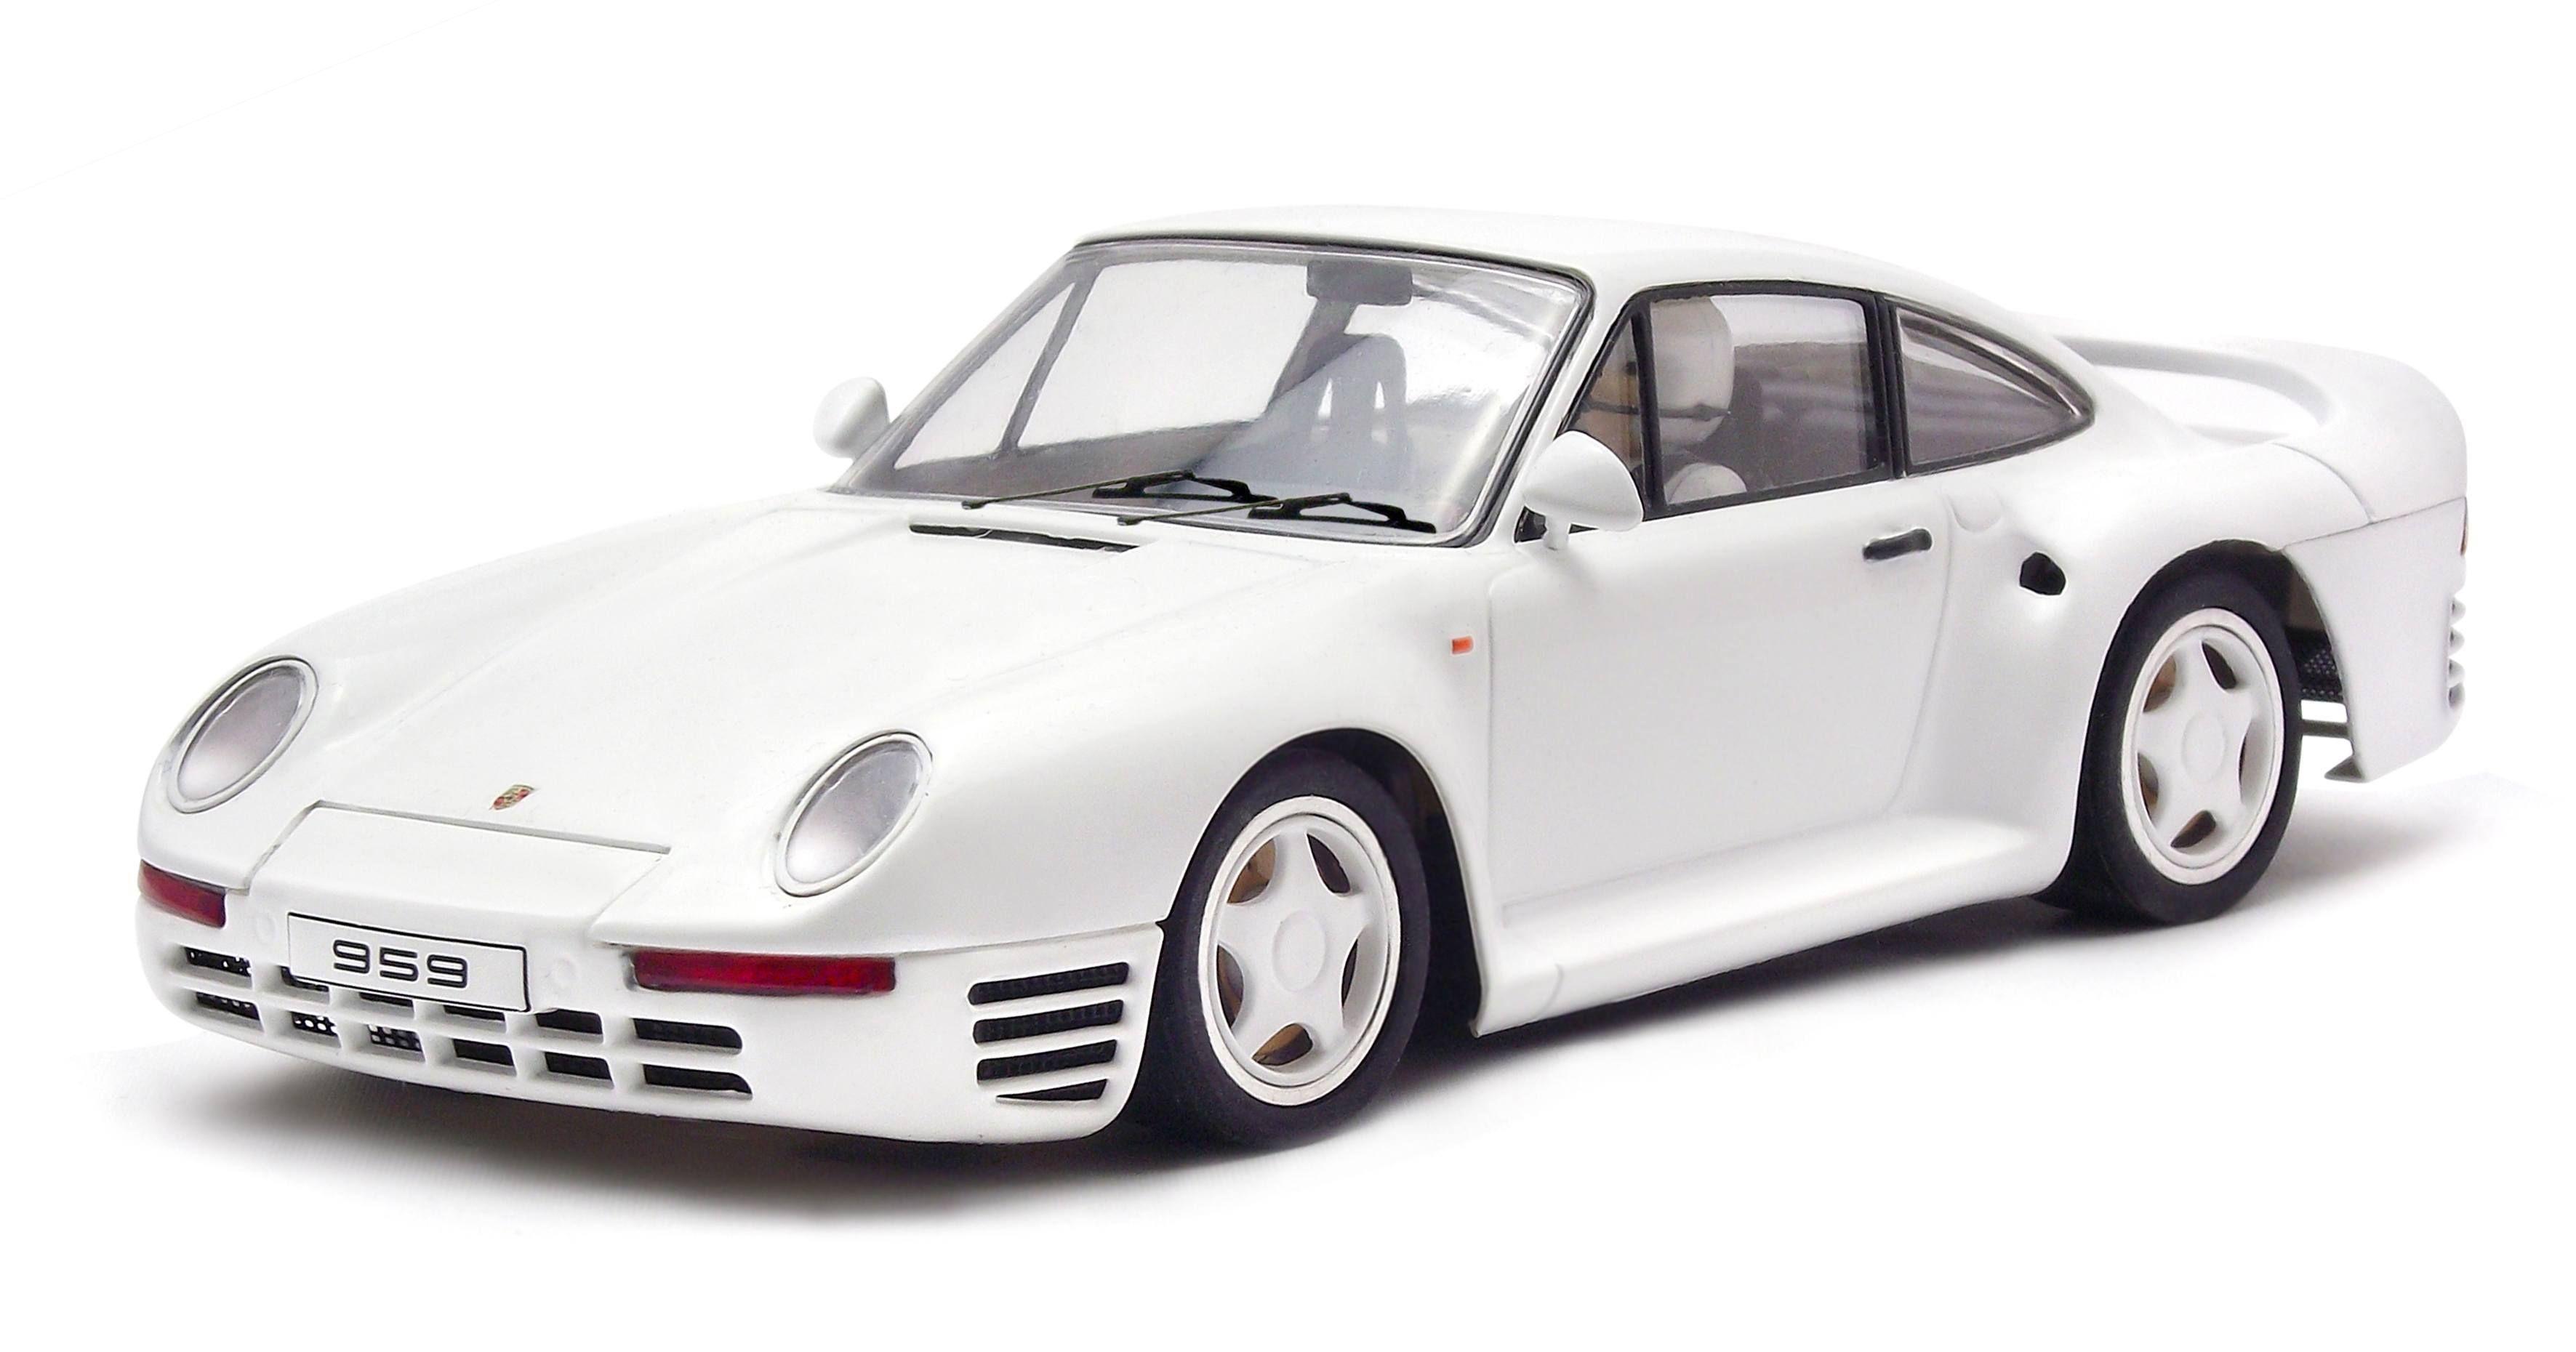 MSC Competition MSC-6032 Porsche 959 Street Car Blanc